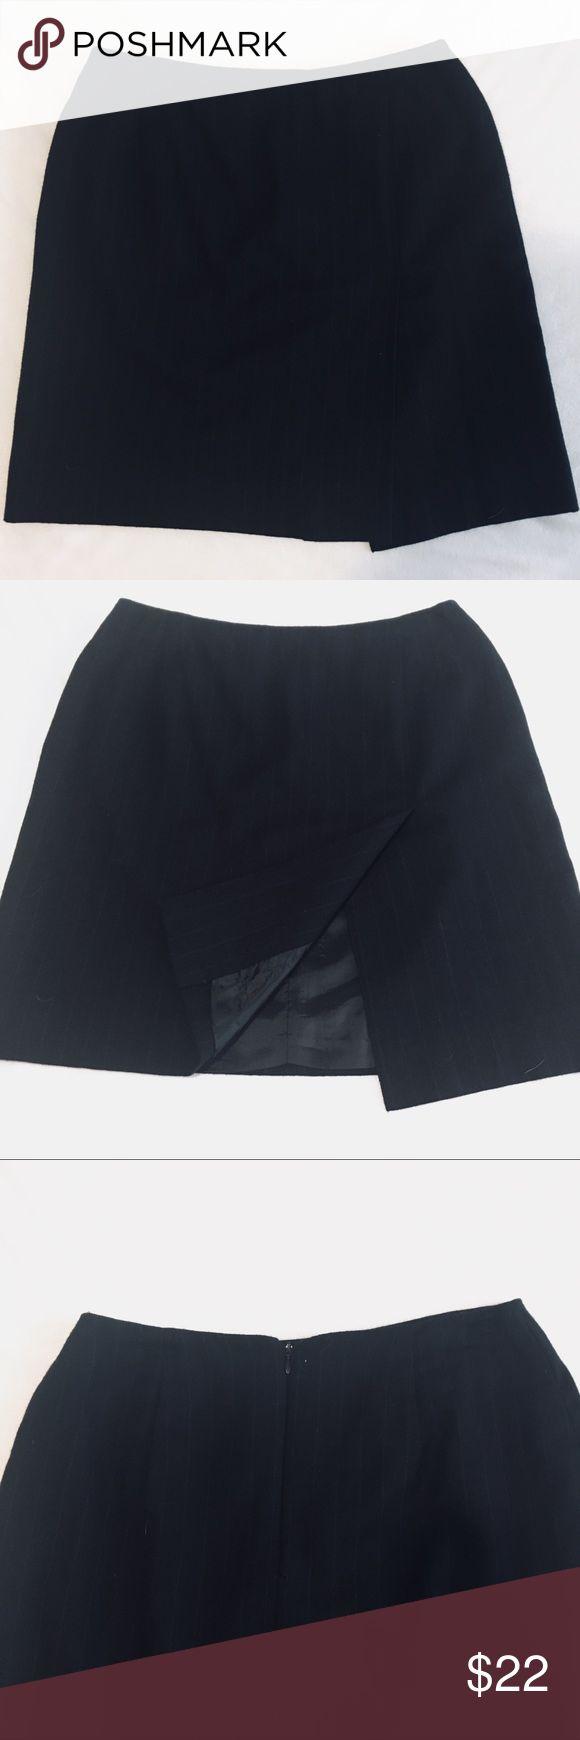 "✨NEW ITEM✨Ralph Lauren Petite Wool Pinstripe Skirt Worn two times. Near perfect condition! Skirt has a slit/flap on front.  Zip up the back. Fully lined. Very light pinstripe.  100% Worsted Wool Petite 19"" in length Waist: 16"" across front flat. Lauren Ralph Lauren Skirts Mini"